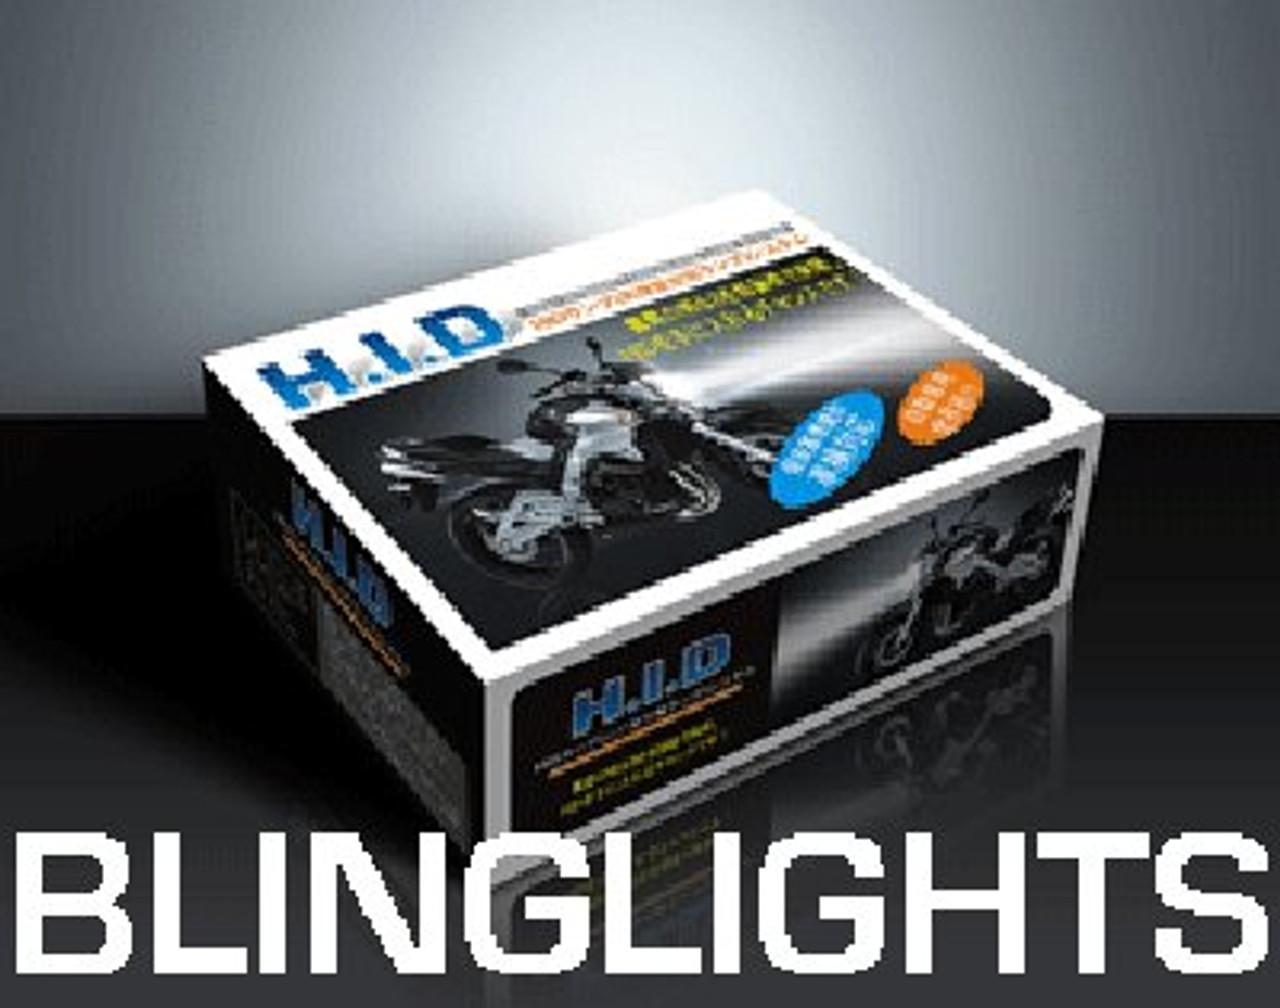 1993-2009 HARLEY-DAVIDSON SPRINGER SOFTTAIL HID HEAD LIGHT LAMP 1994 1995 1996 1997 1998 1999 2000